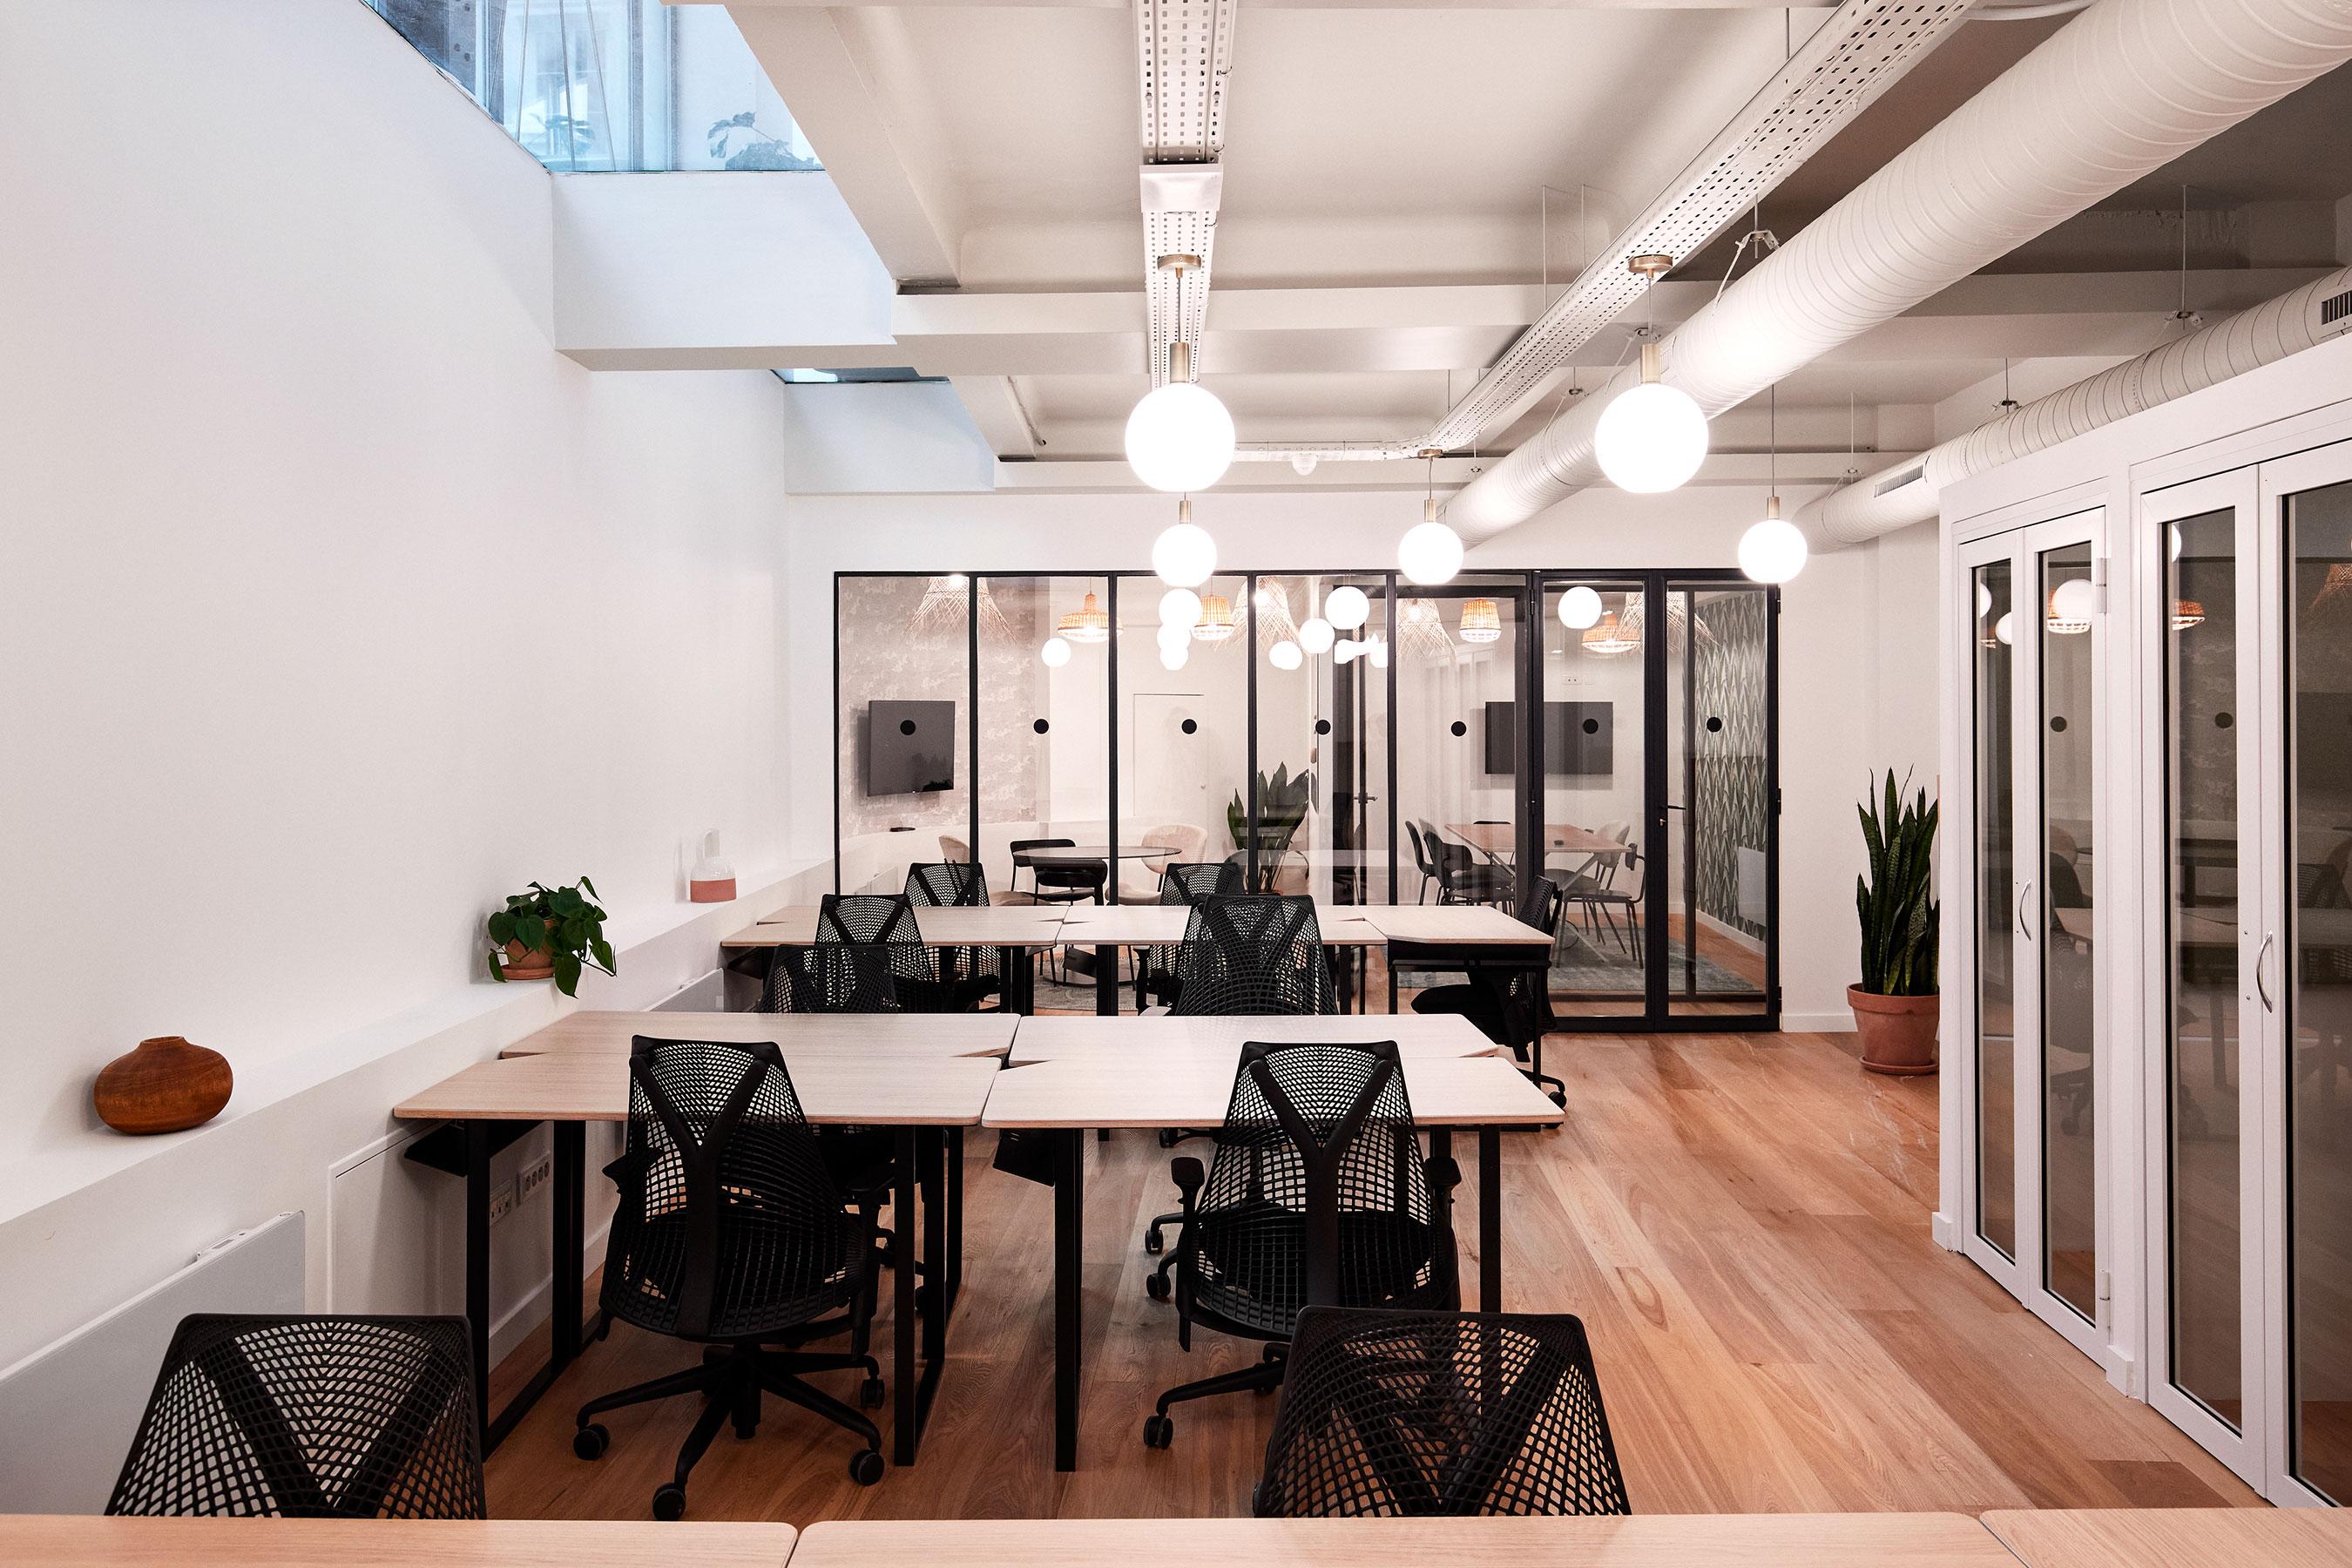 location bureau paris 2 -Bureau et salle de réunion